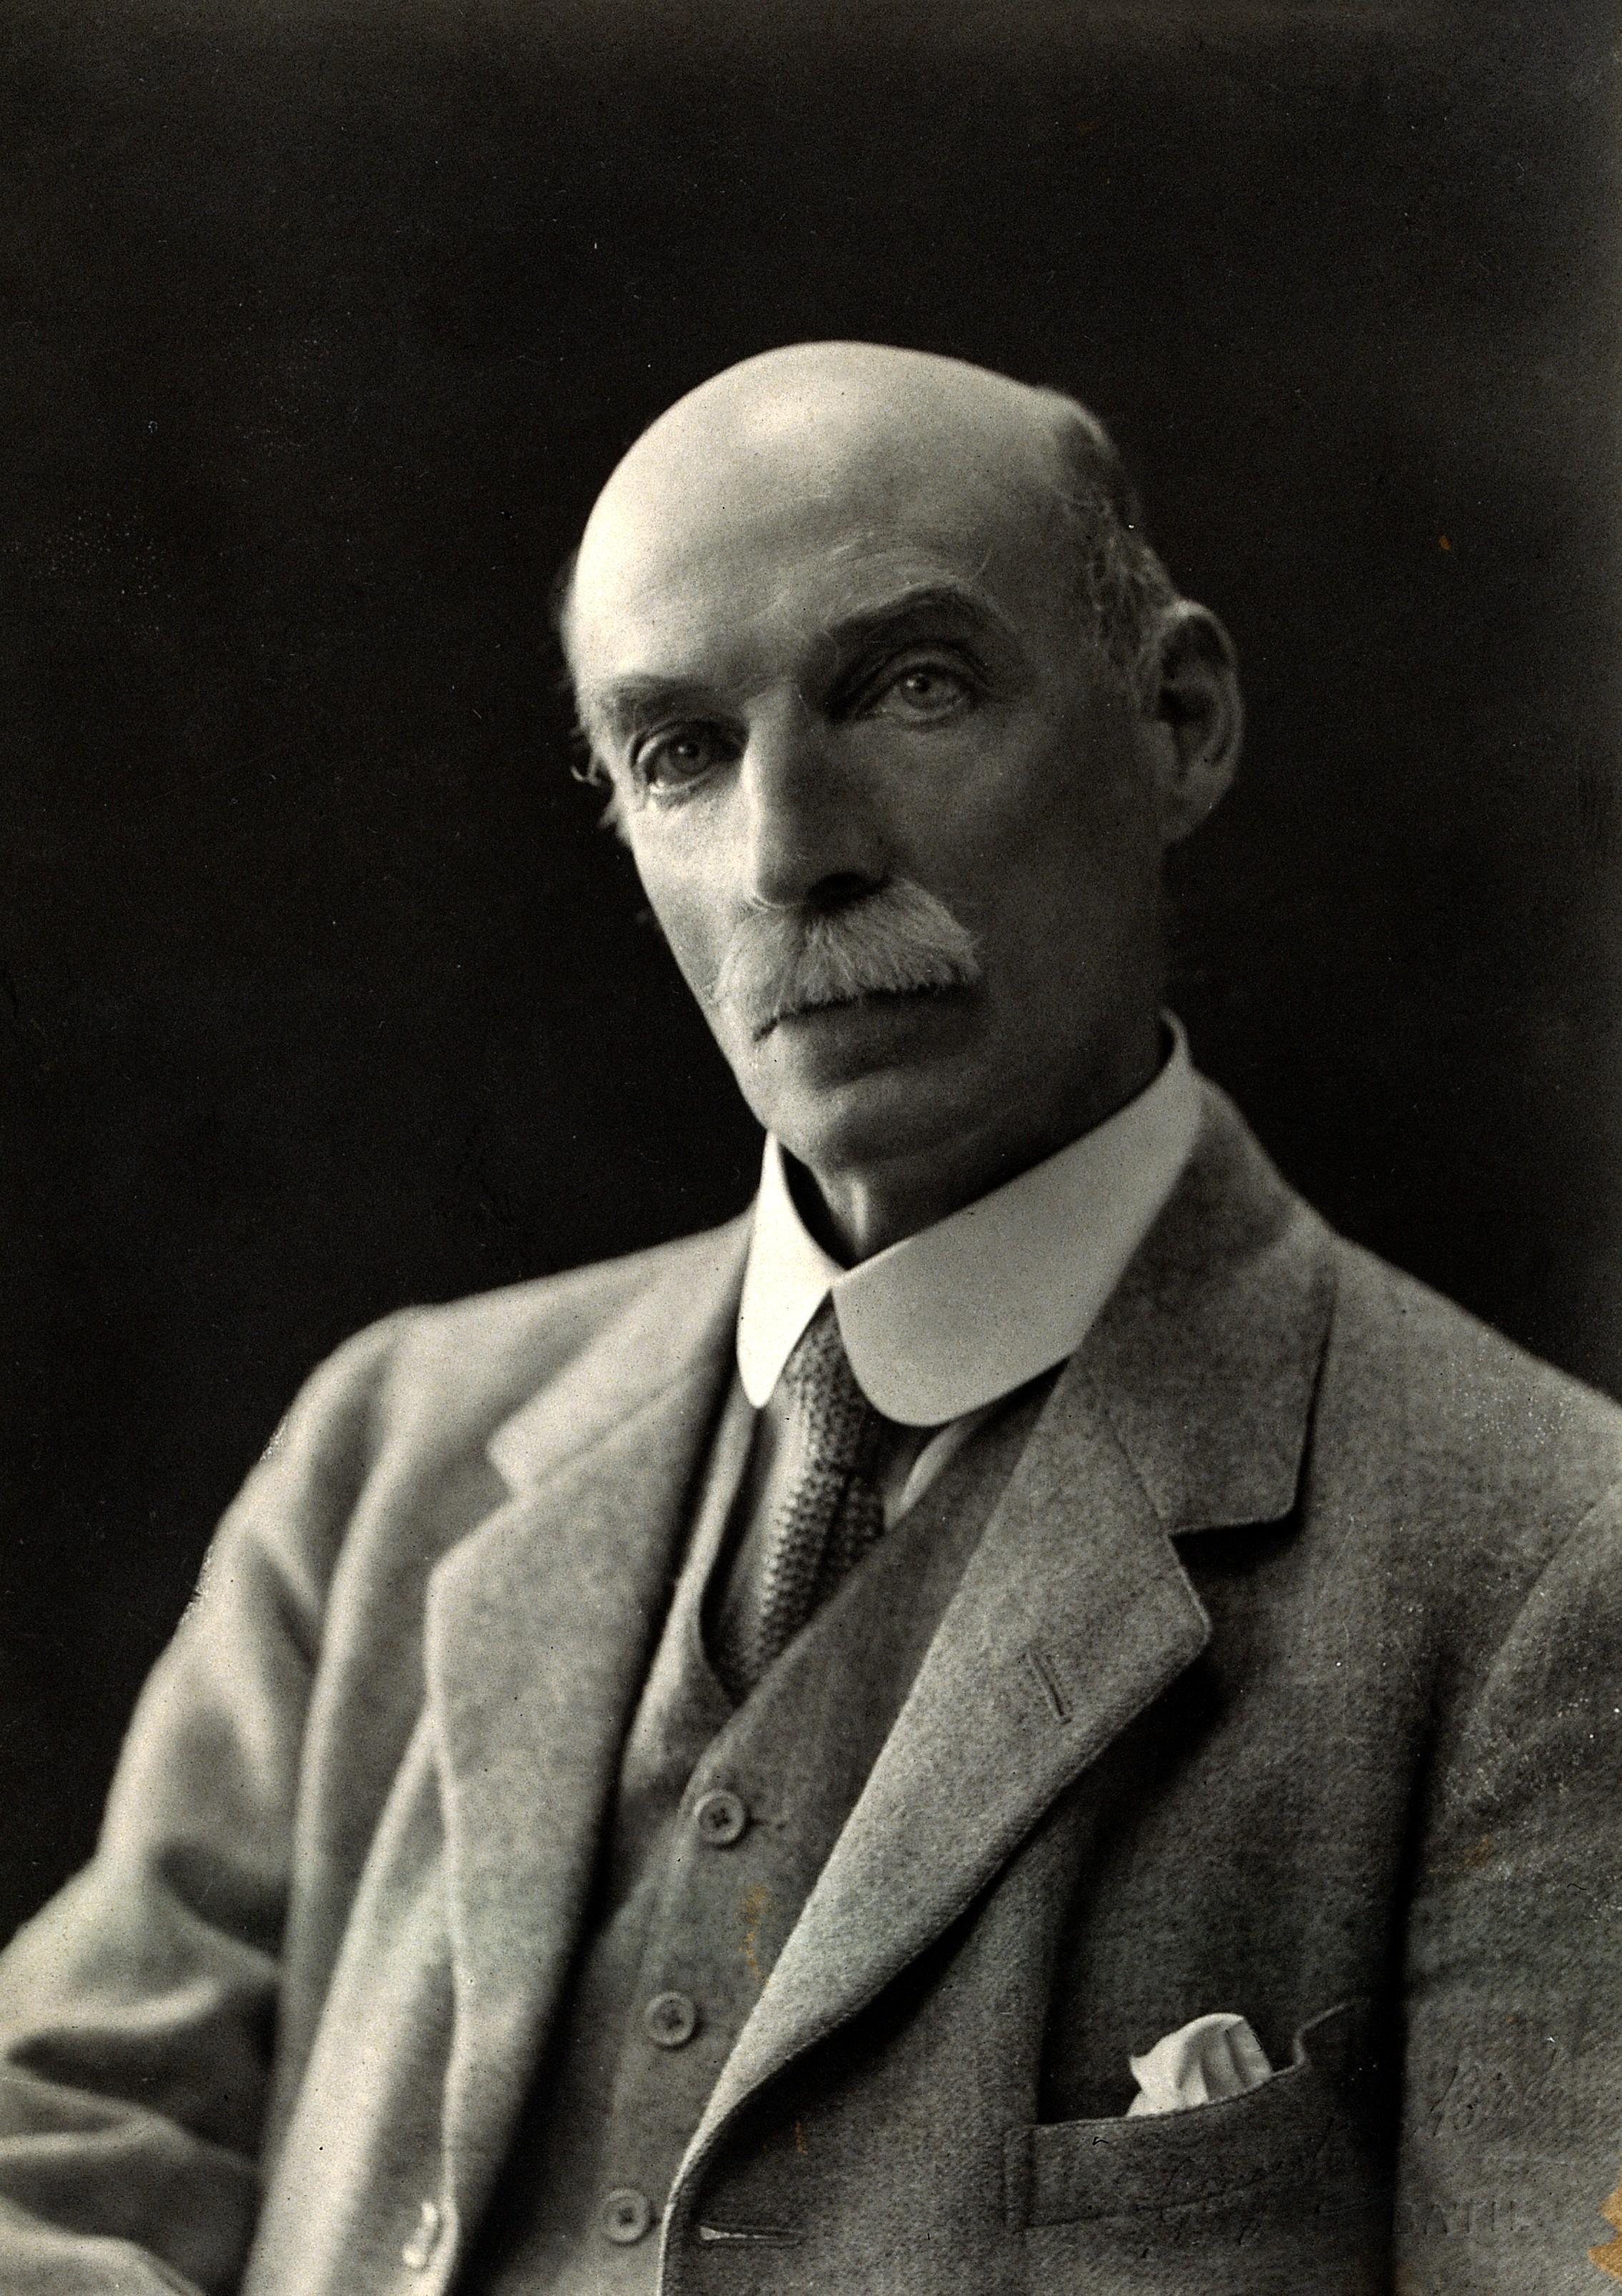 Thomas Morison Legge, photograph by [[Graystone Bird